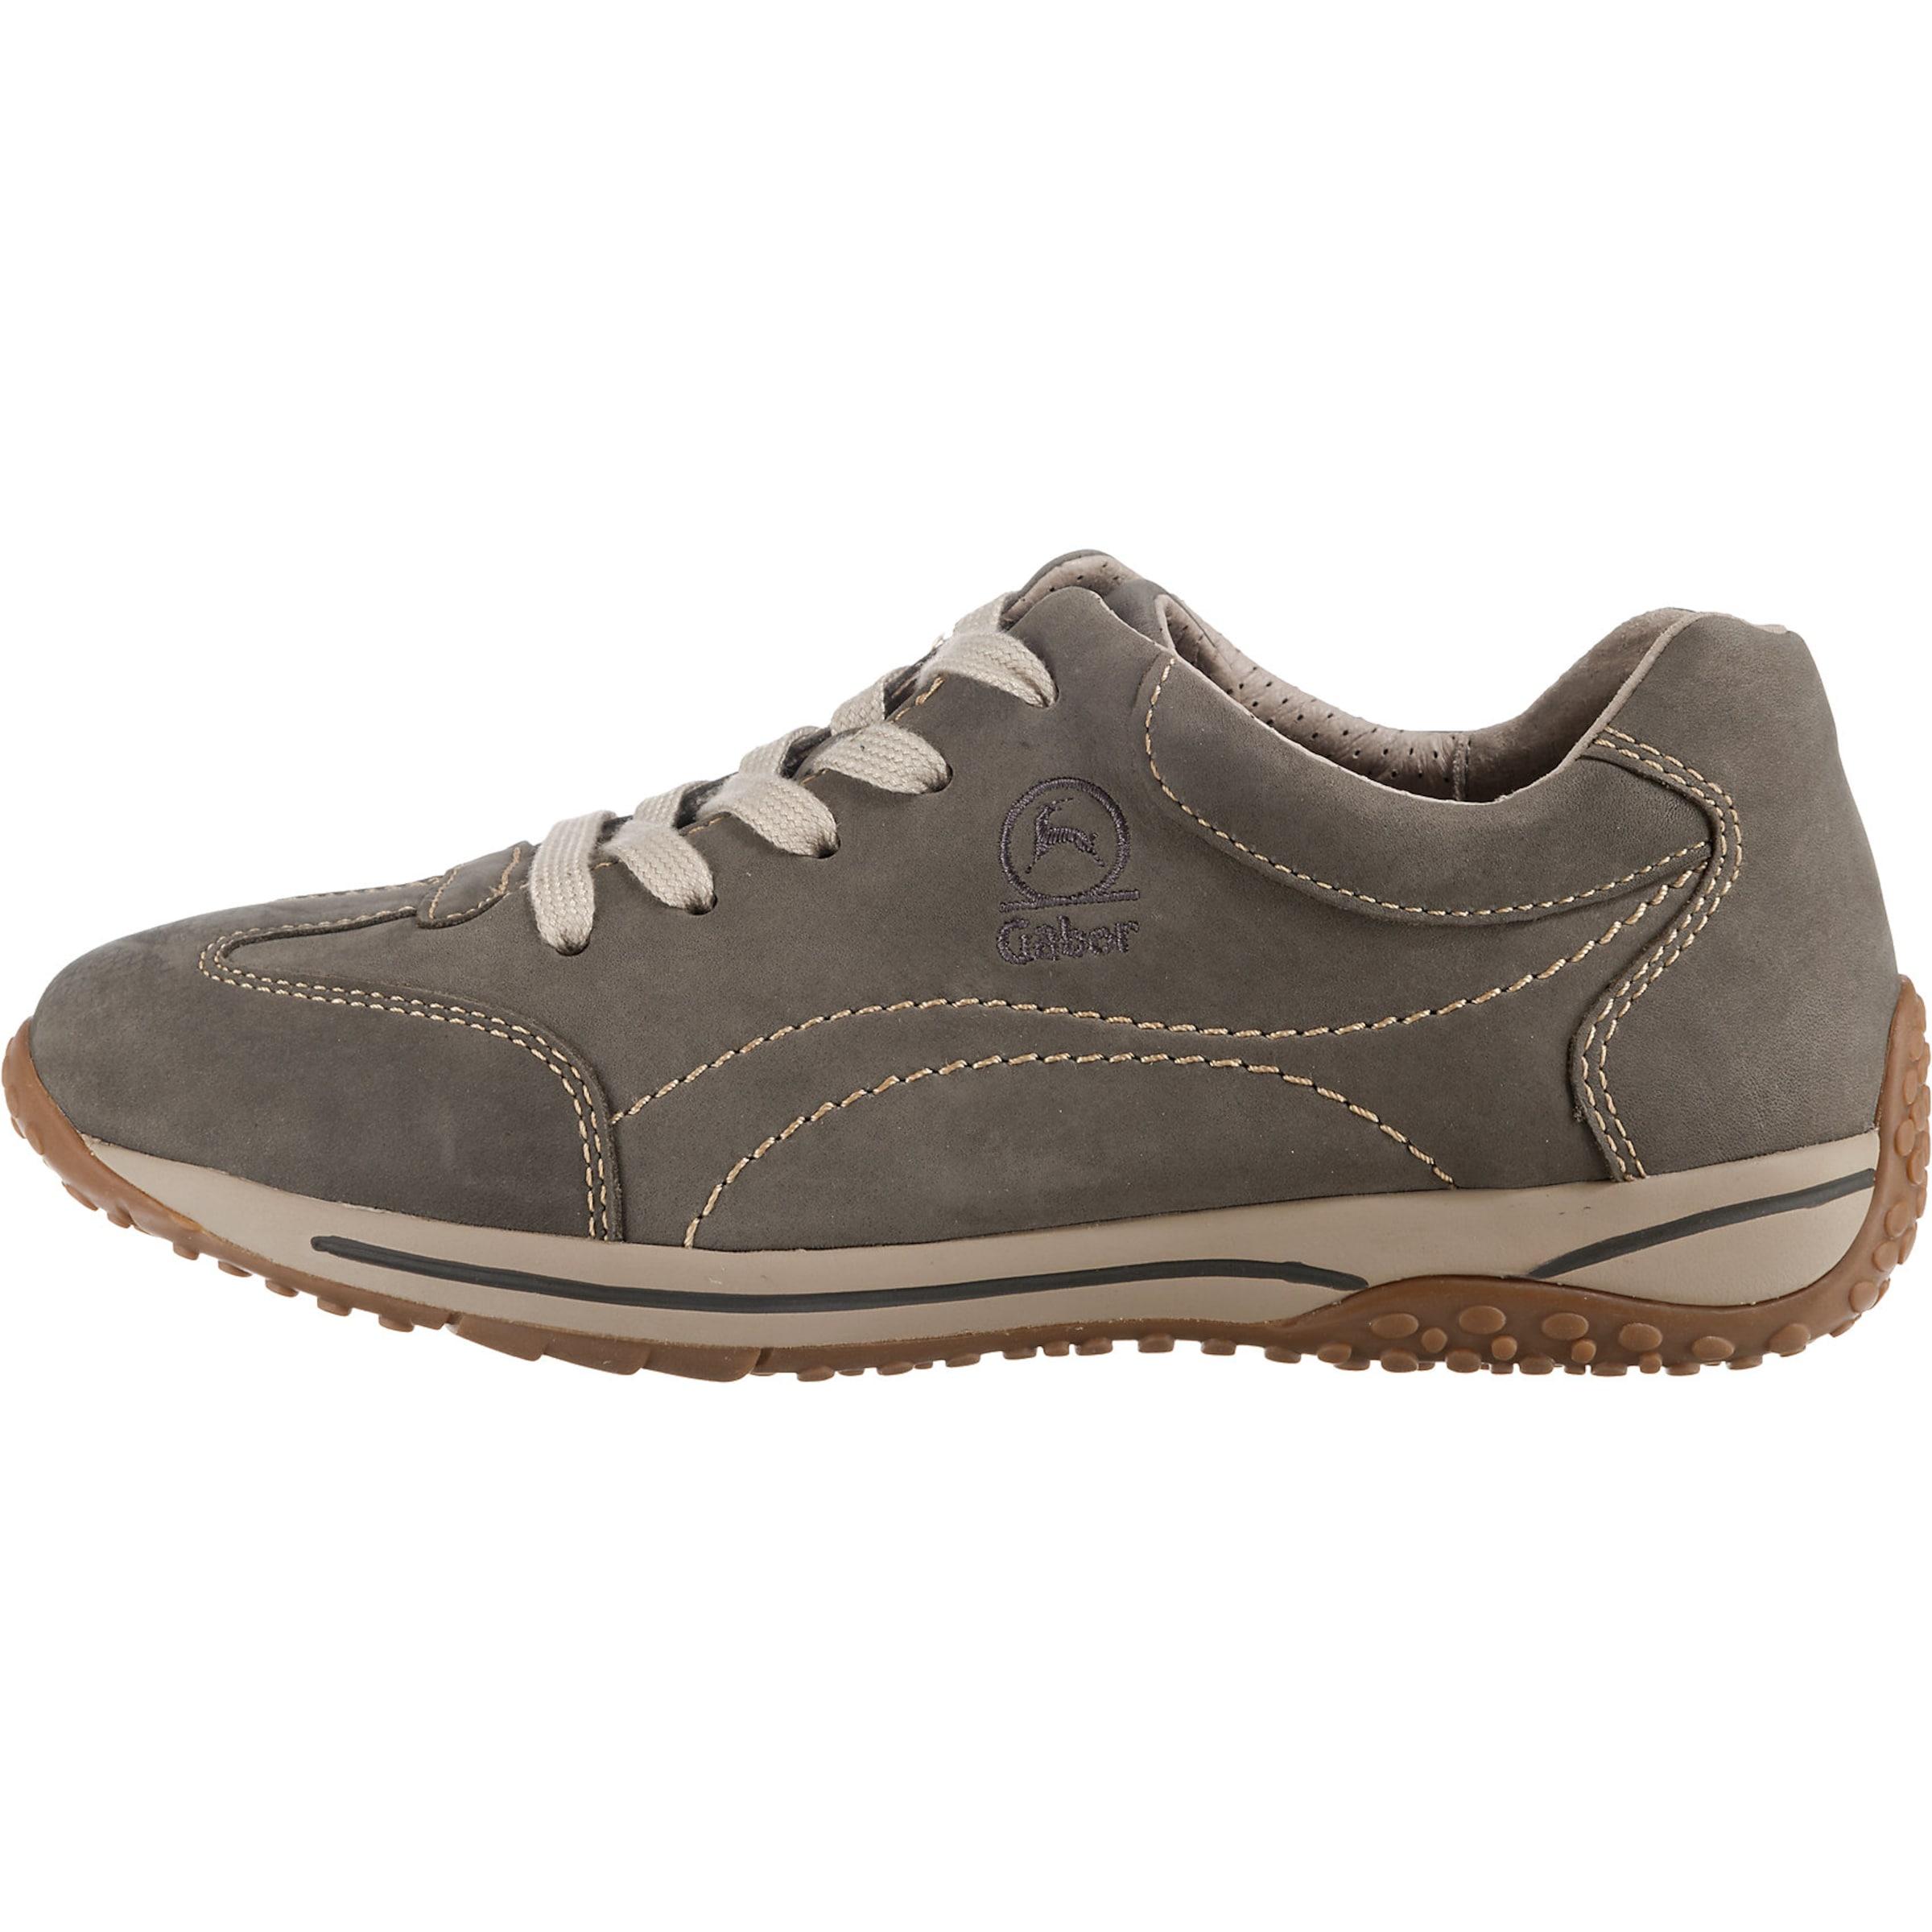 Sneakers Gabor Low Gabor Rauchgrau Rauchgrau Sneakers Sneakers Gabor In Low In 3AL54Rj